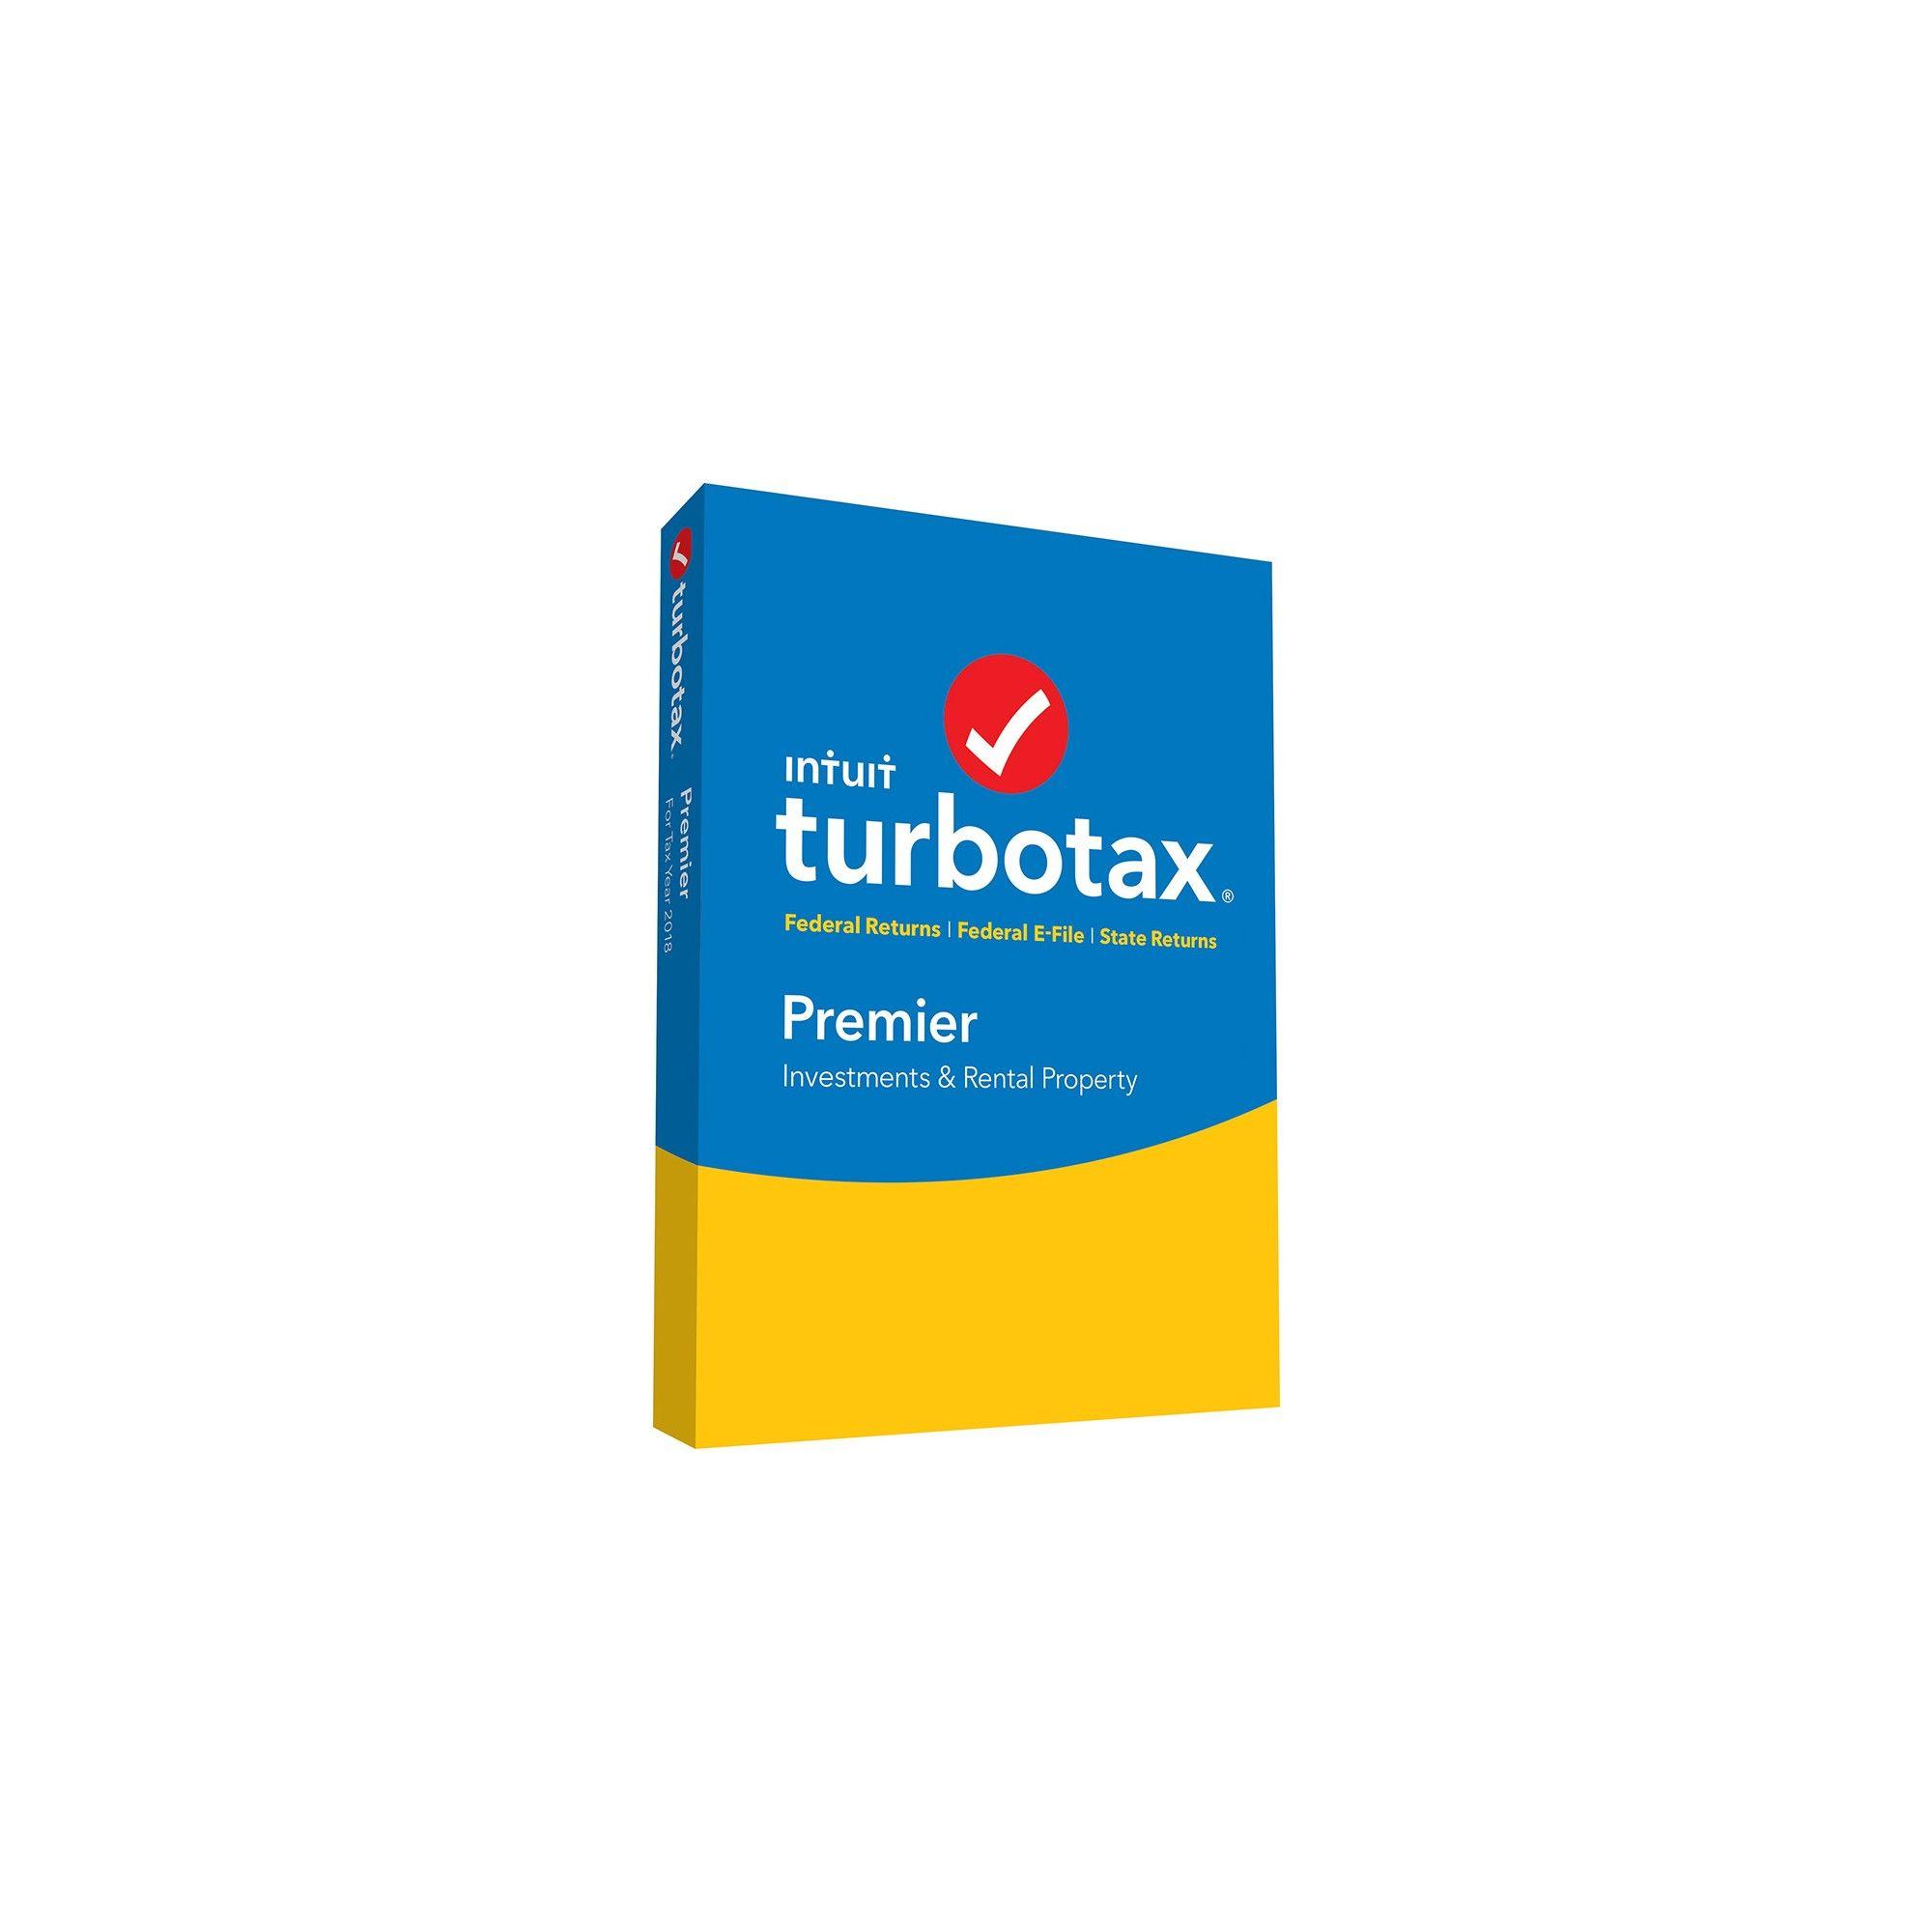 Intuit Turbotax Premier Federal +State 2018 Mac ESD Download